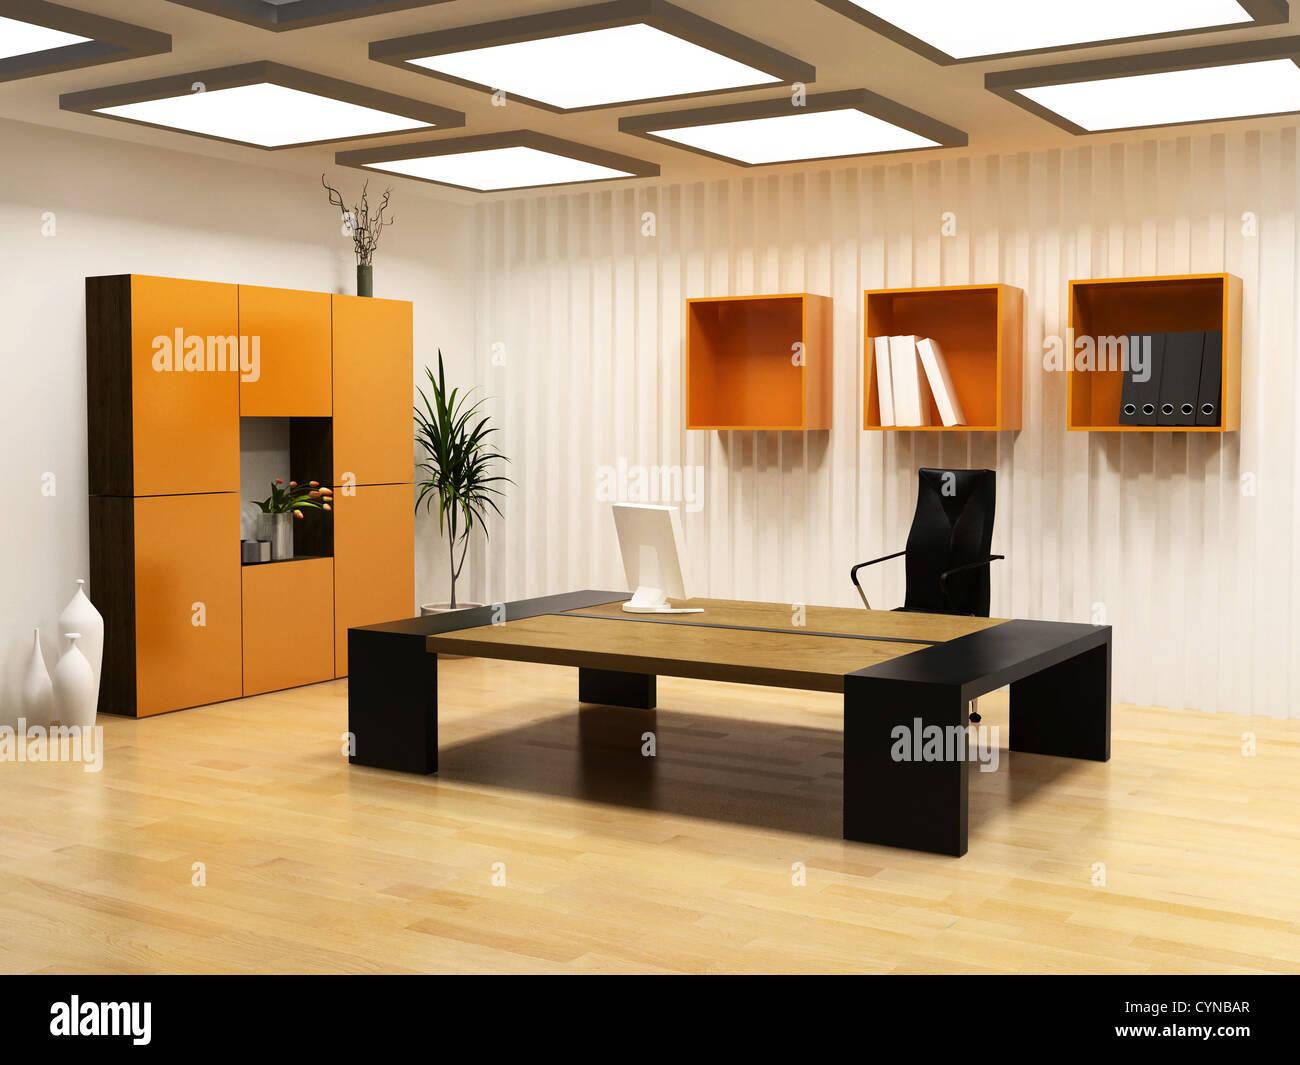 moderne Innenarchitektur des Kabinetts Bossraum (3D Render Stockfoto ...